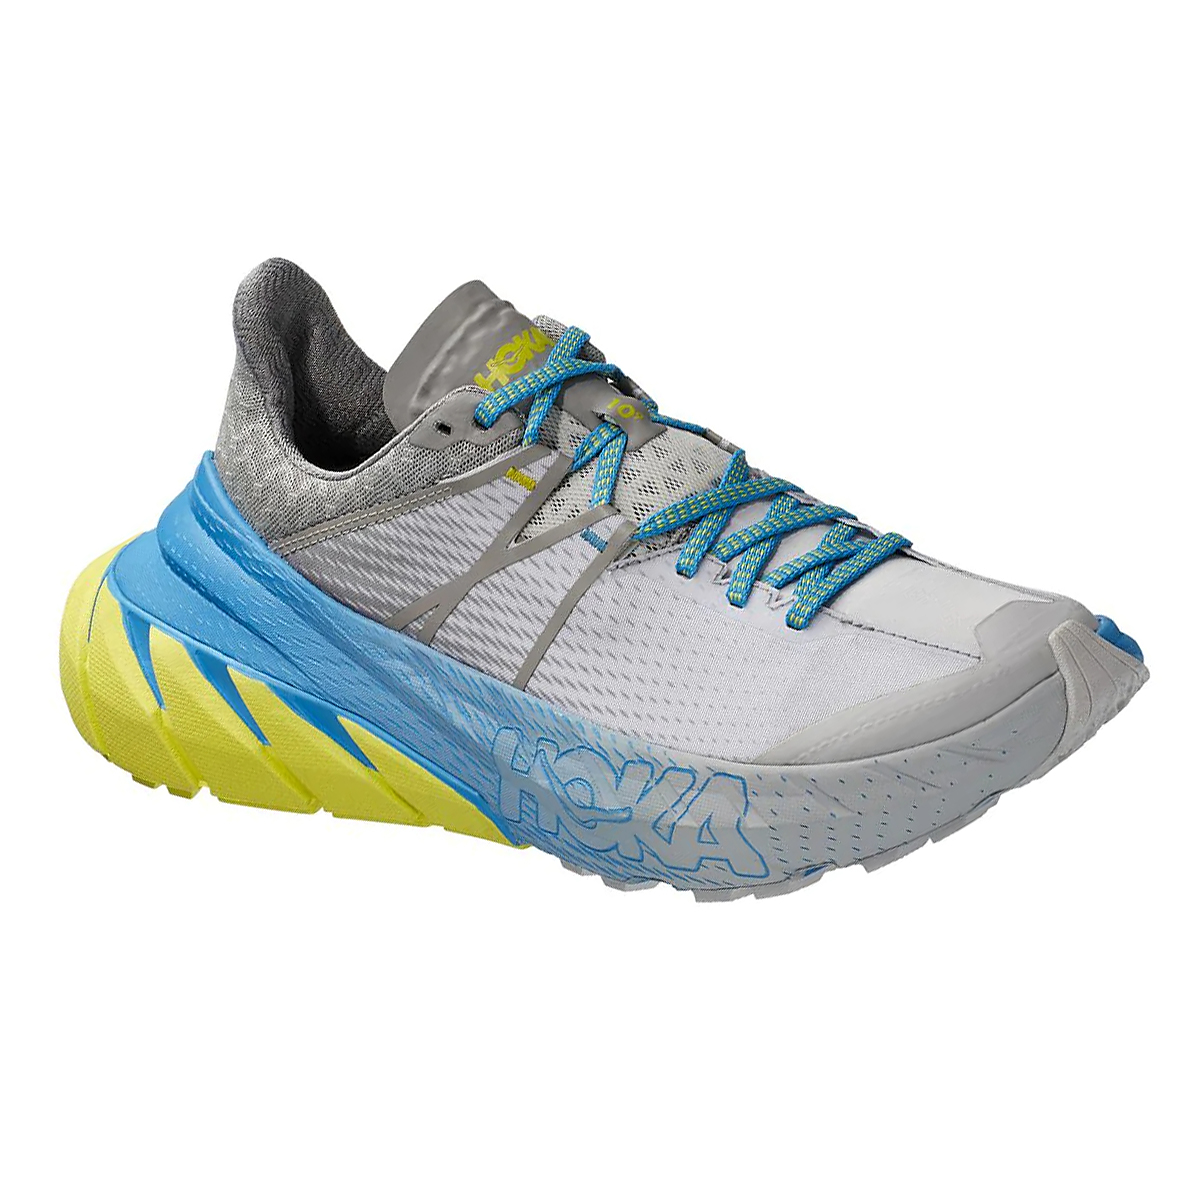 Men's Hoka One One Tennine Running Shoe - Color: Drizzle/Lunar Rock - Size: 8 - Width: Regular, Drizzle/Lunar Rock, large, image 1